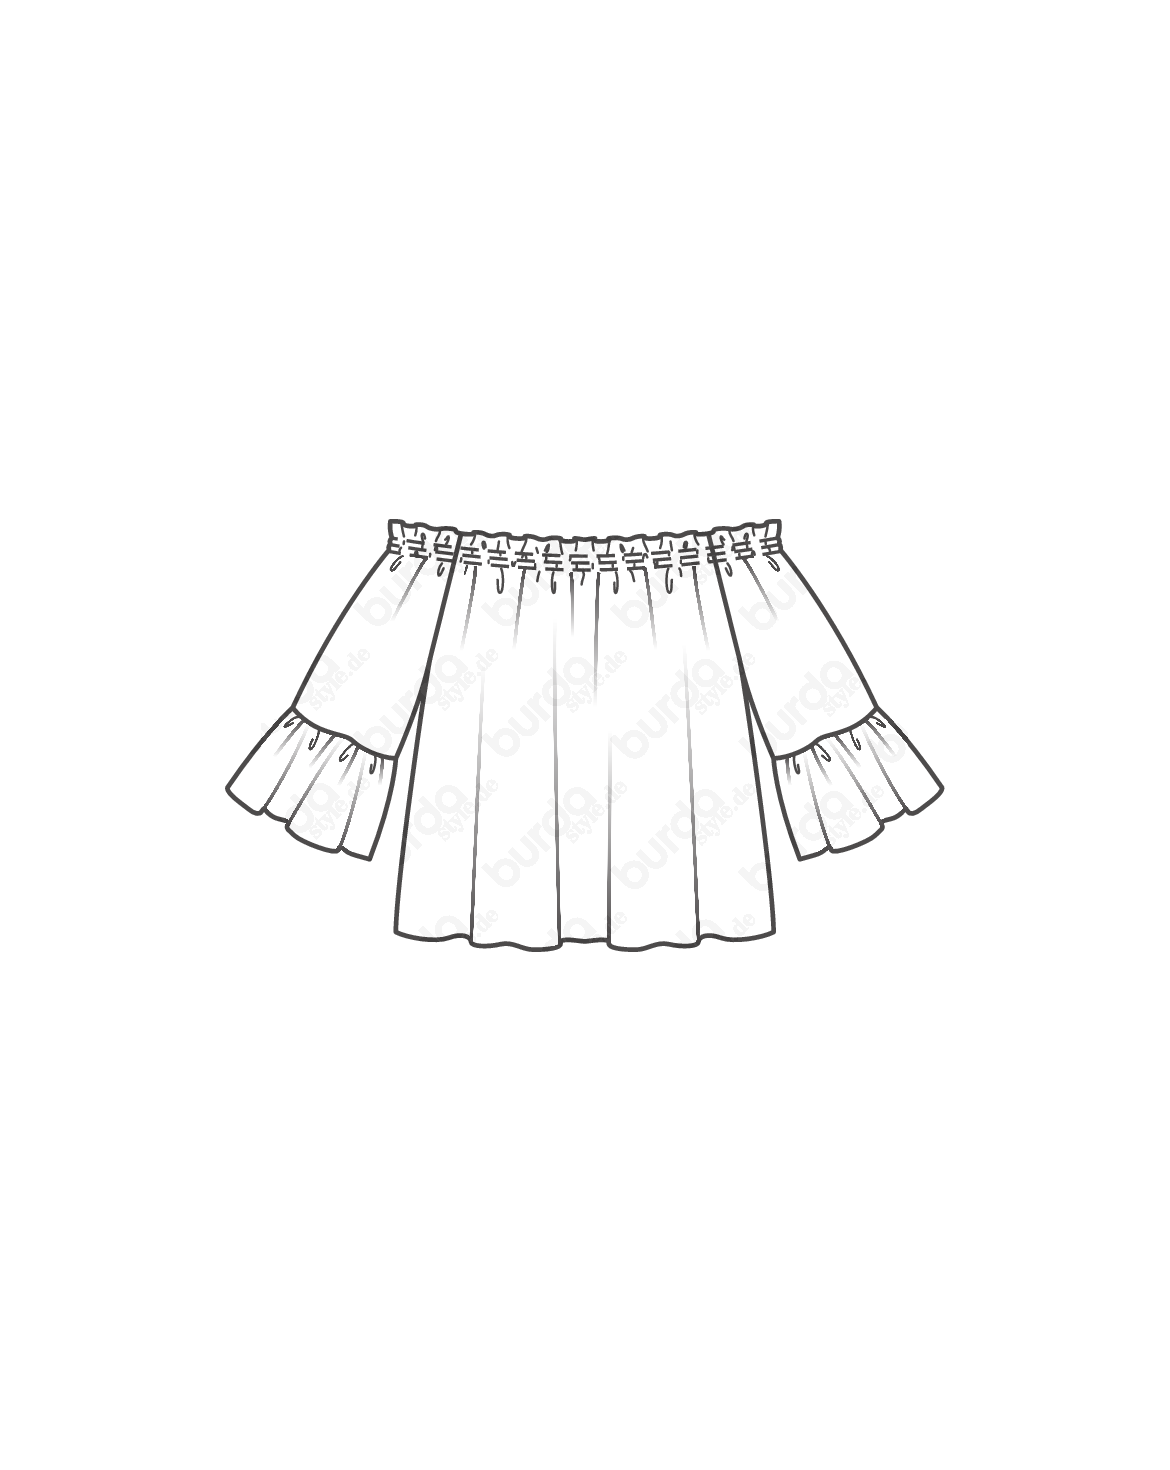 Schnittmuster Off-Shoulder-Bluse 02/2017 #116 | sewing | Pinterest ...